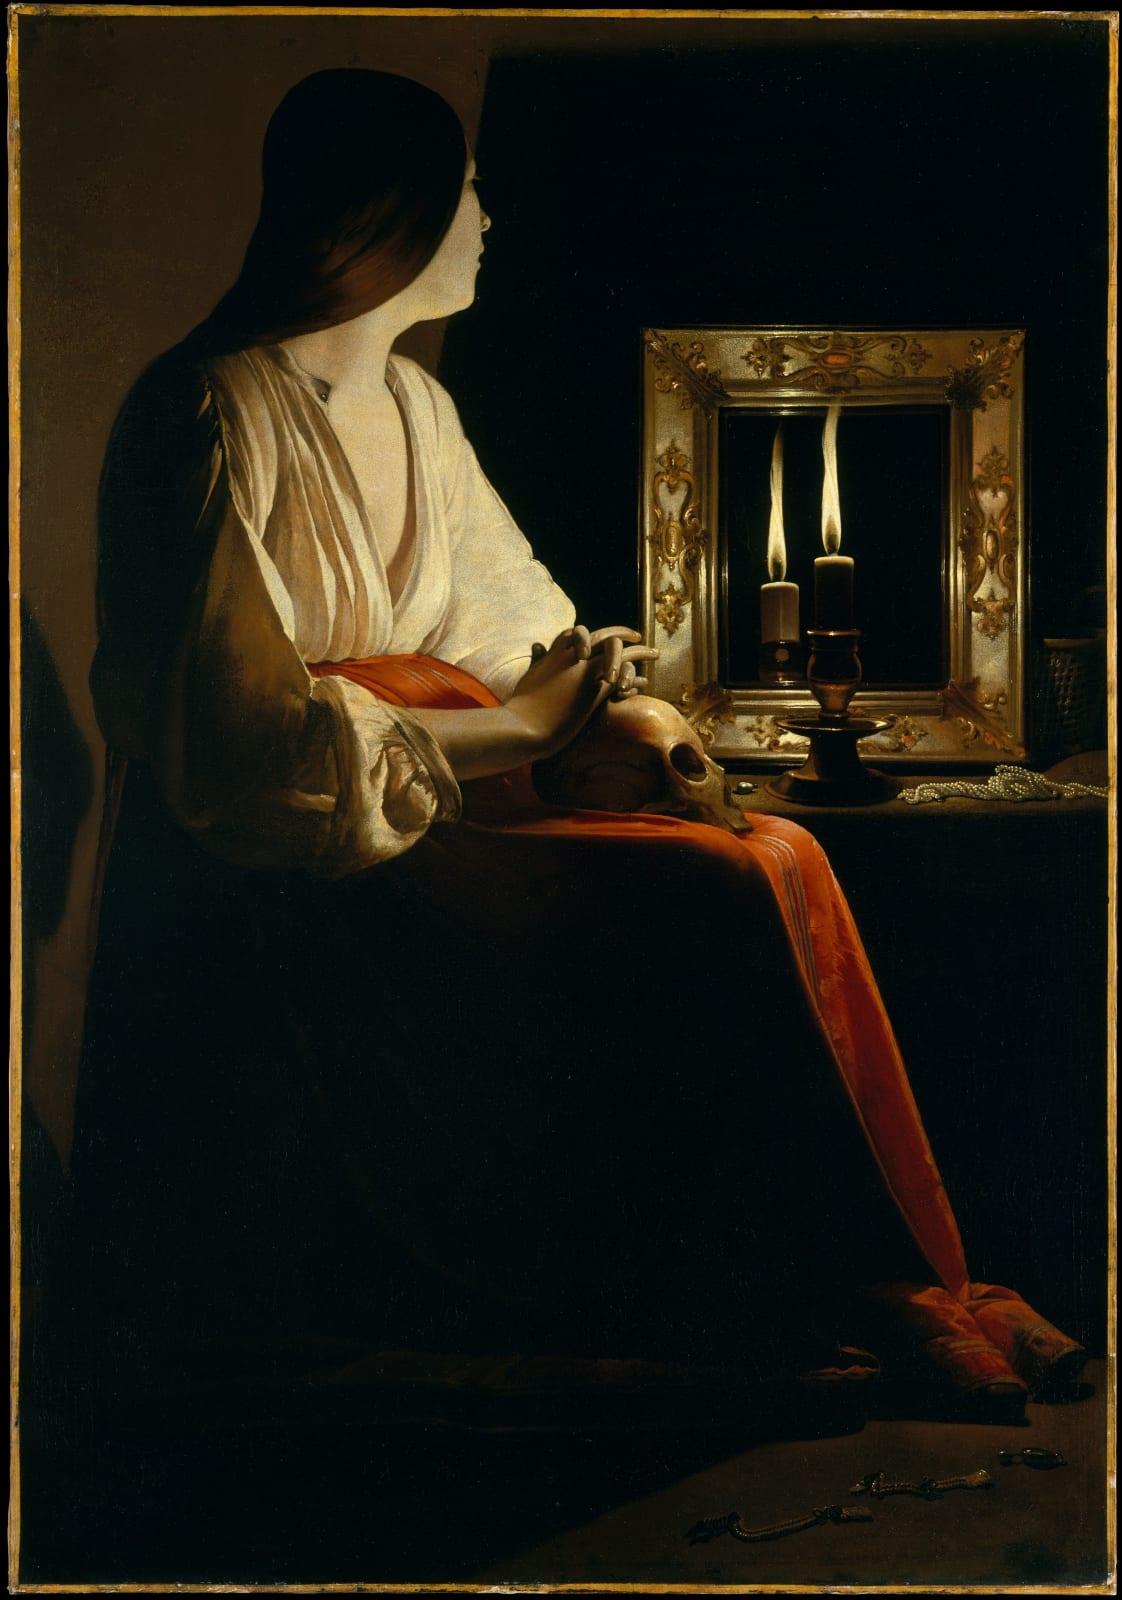 Georges de La Tour The Penitent Magdalen, ca. 1640 Courtesy of The Metropolitan Museum of Art, New York.